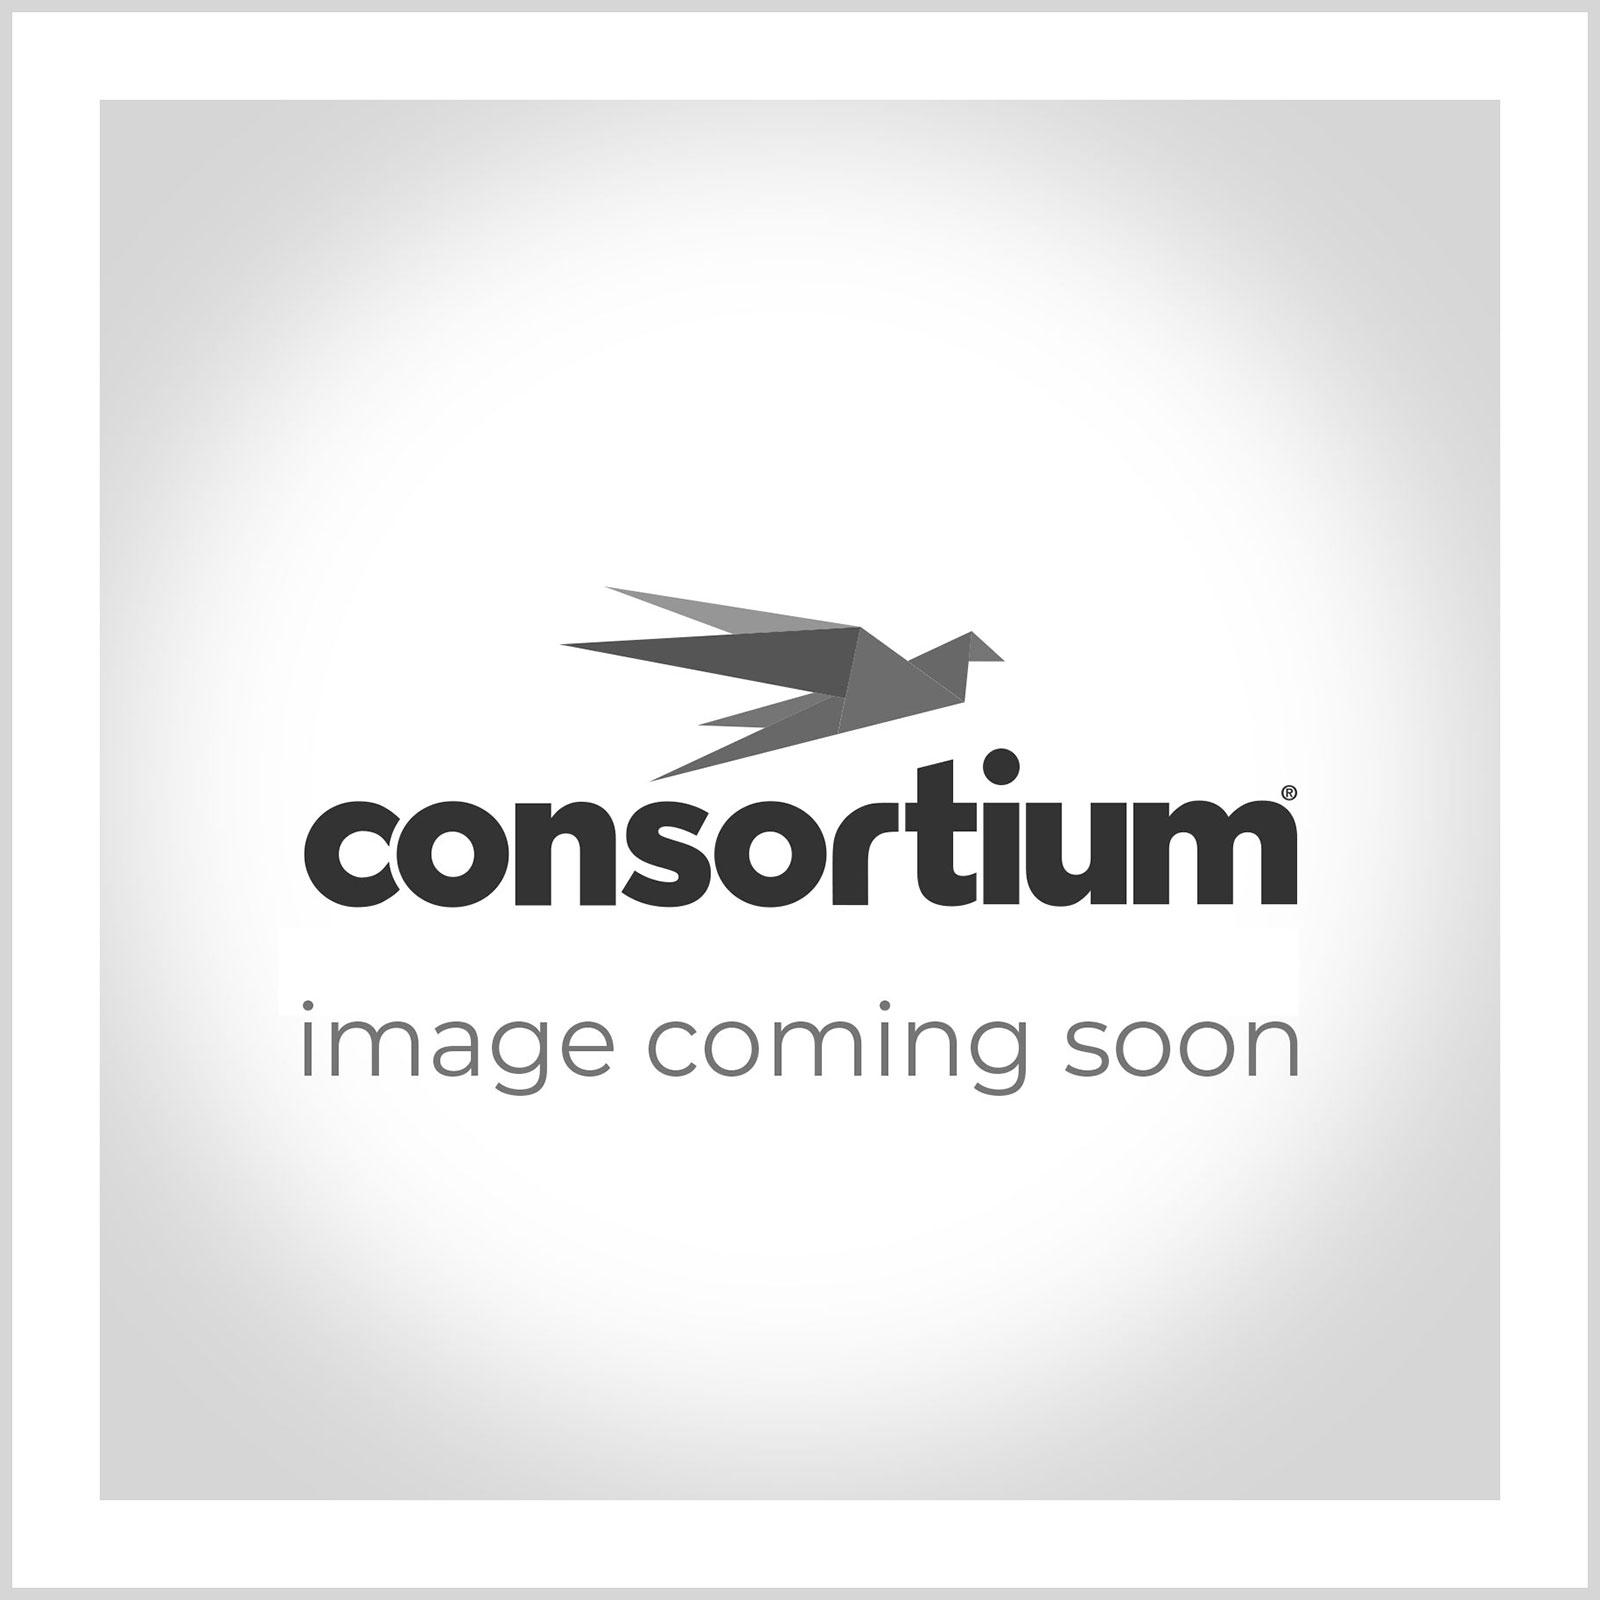 Paper Resource Packs